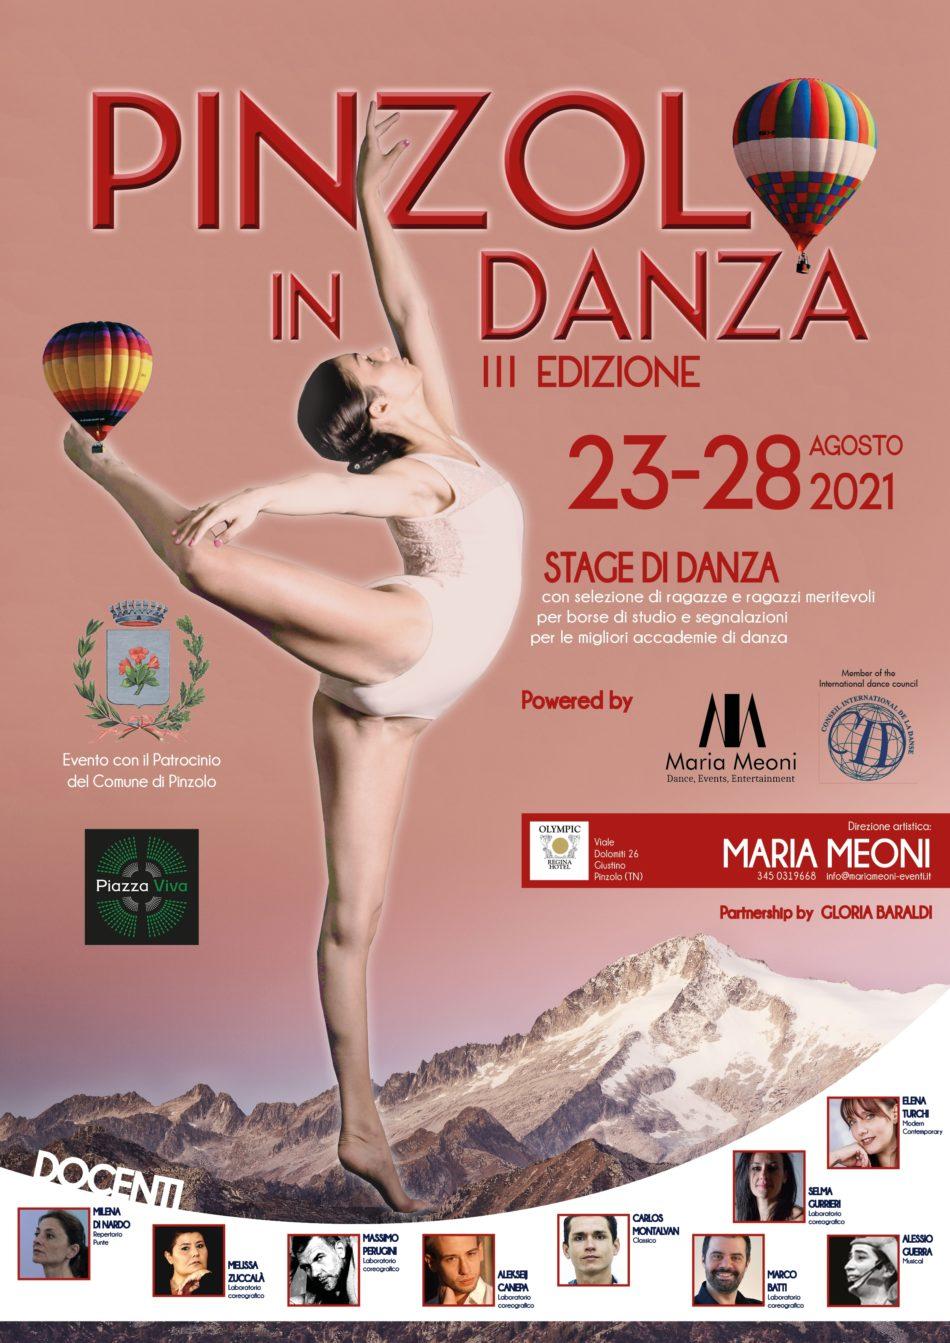 Pinzolo in Danza 2021